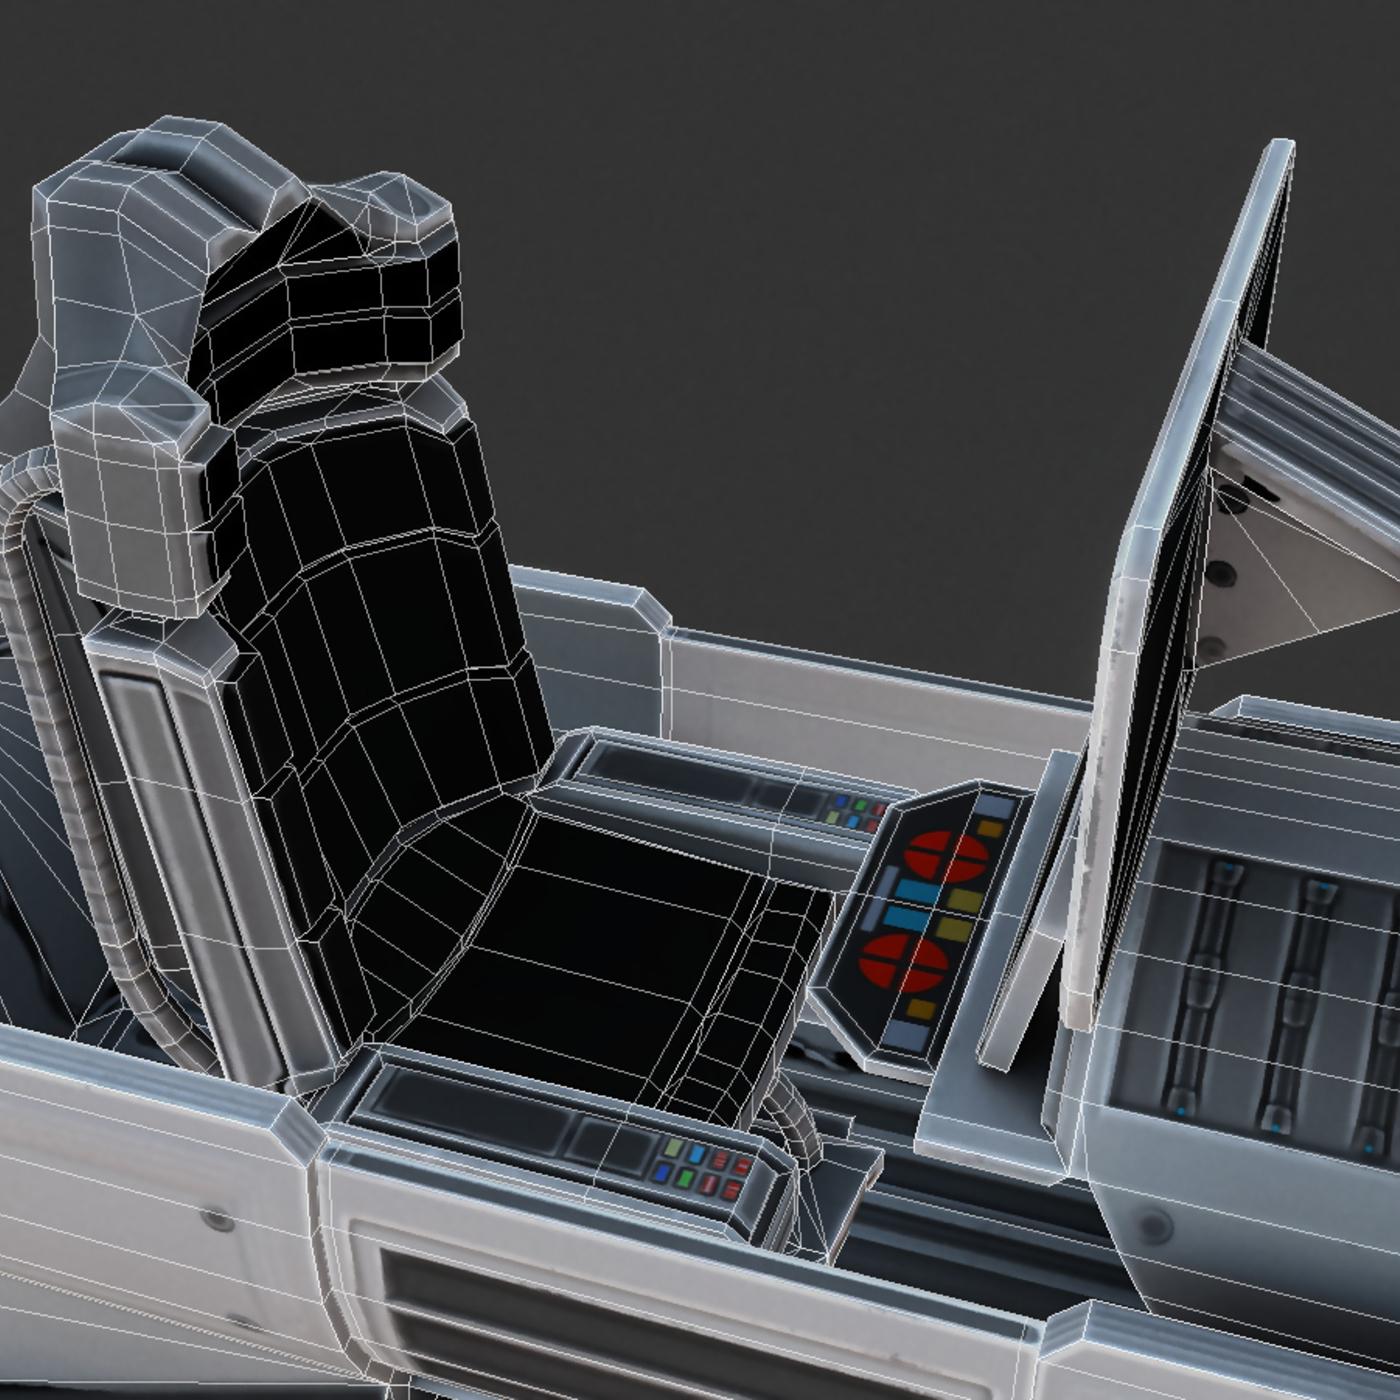 Scifi Vehicle Control Module (Basic-Version)